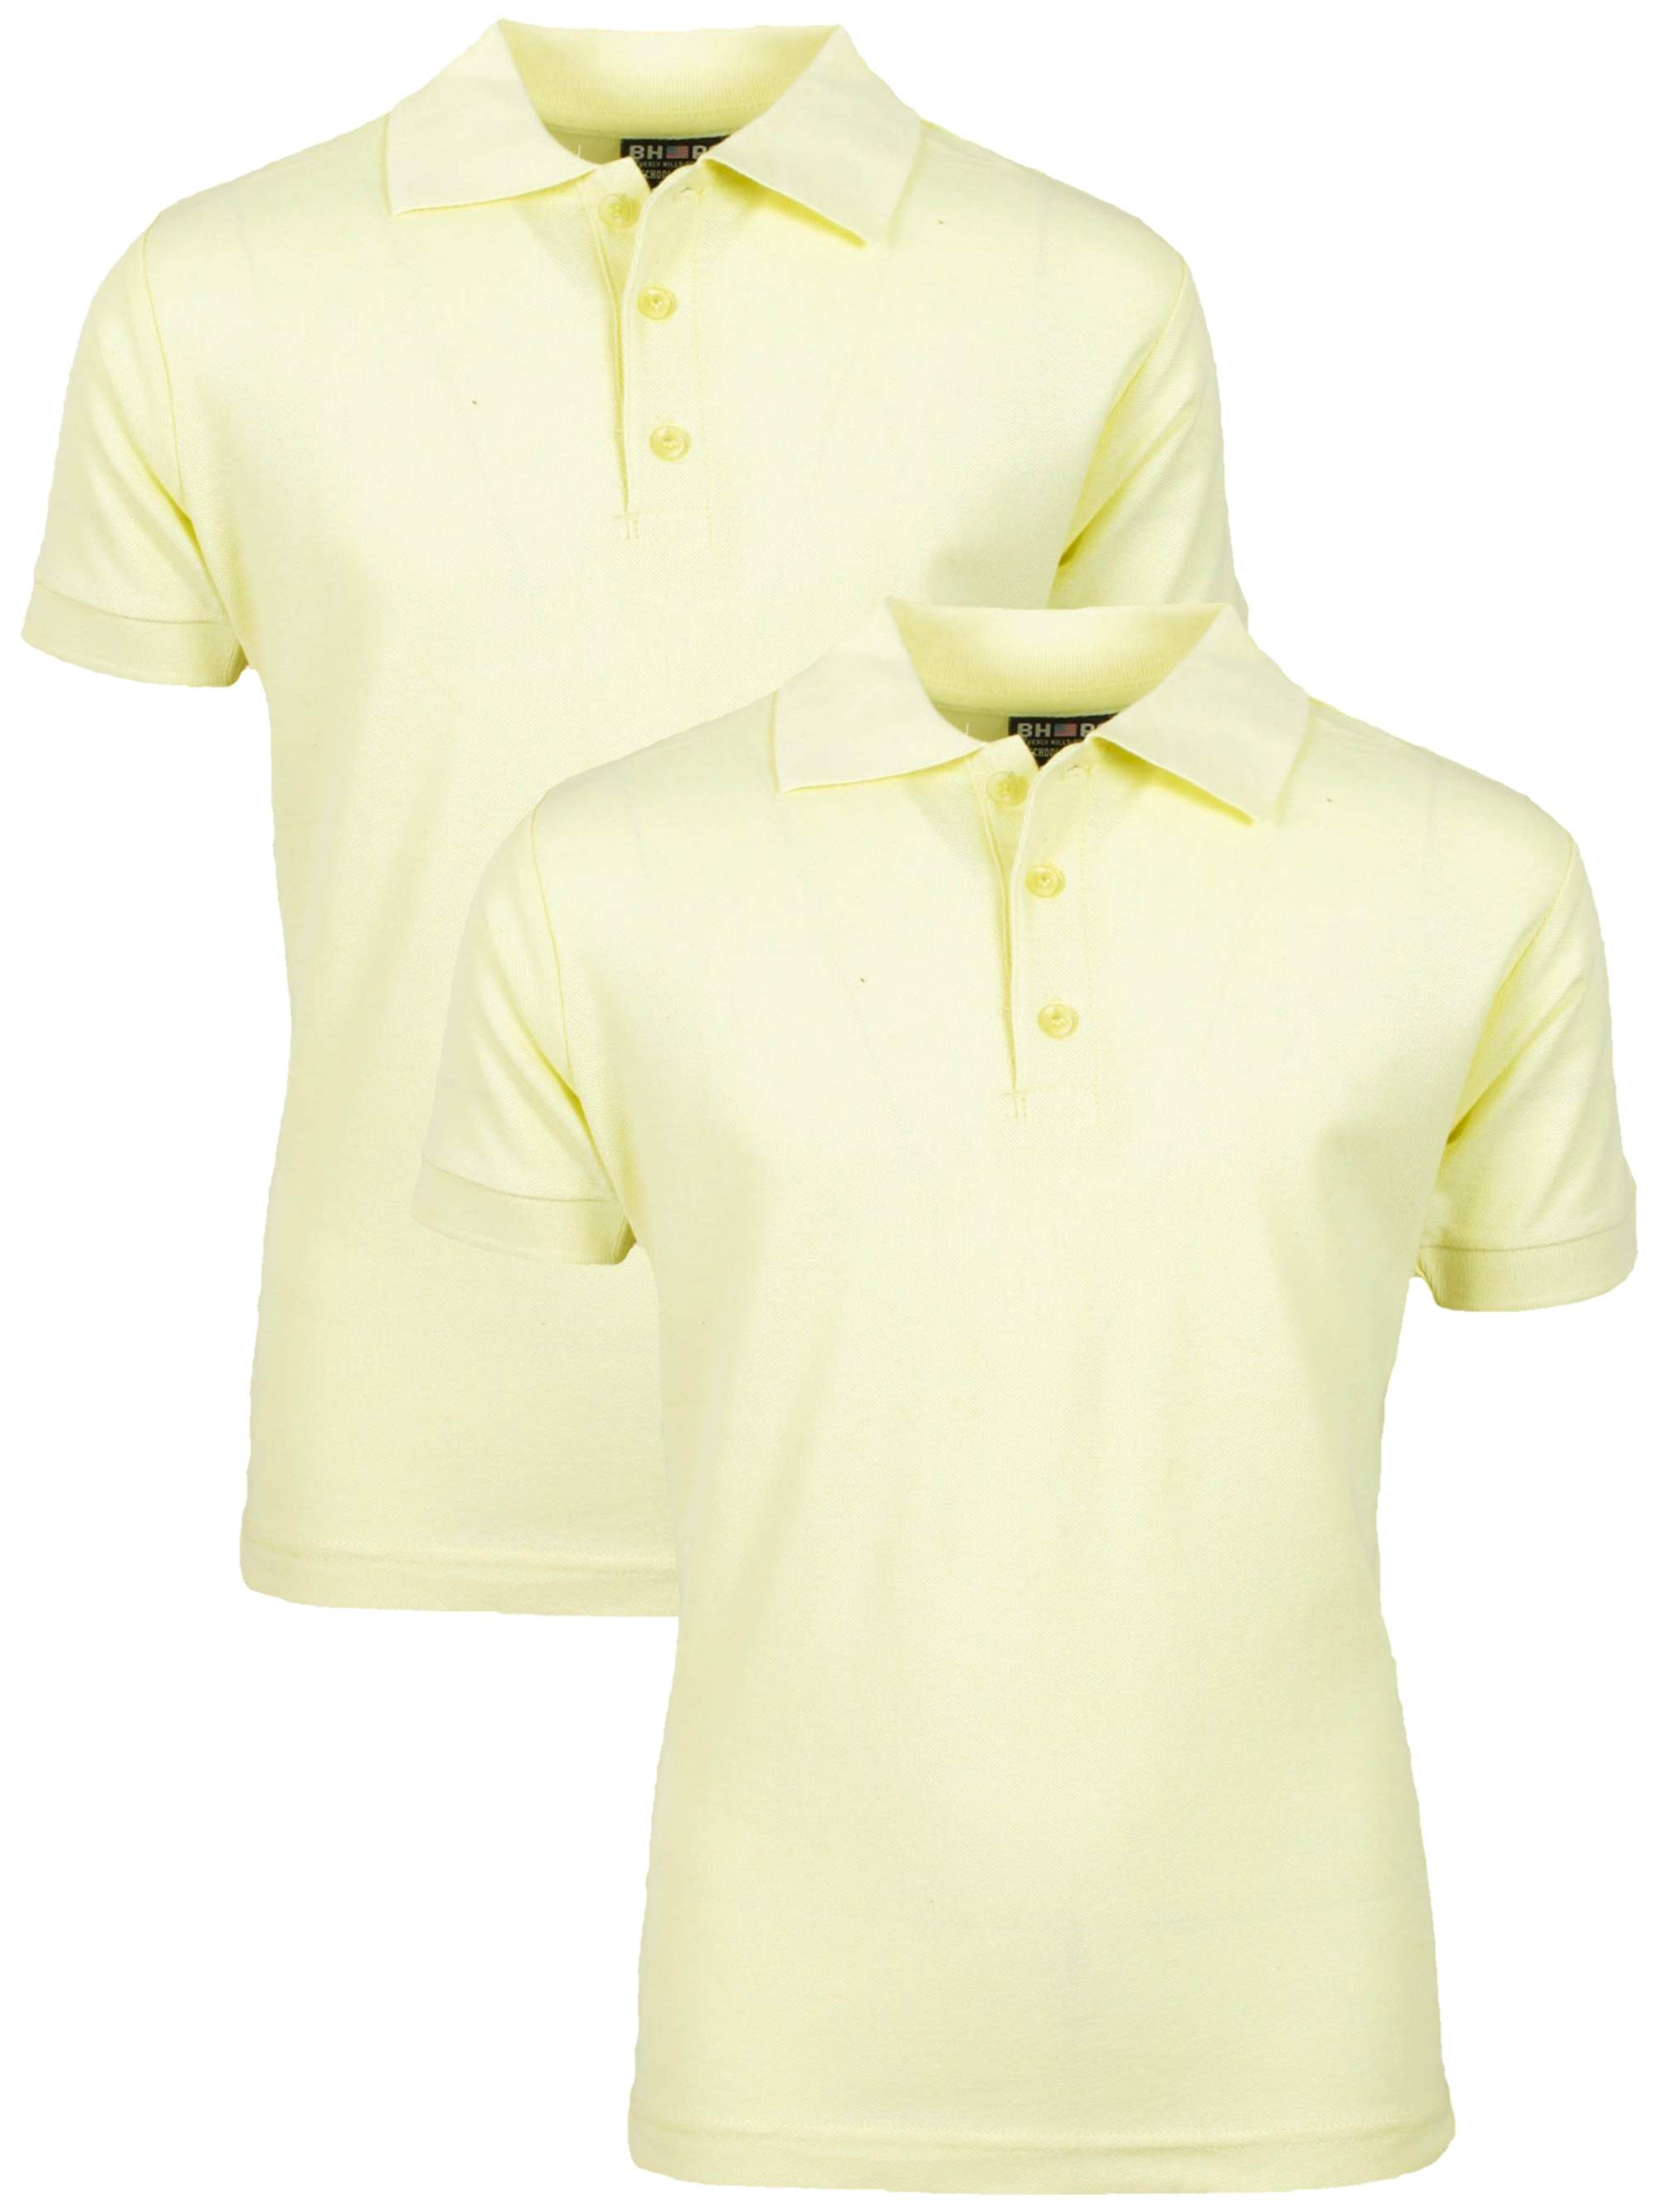 Boy's Uniform 2 Pack Short Sleeve Cotton Jersey Polo